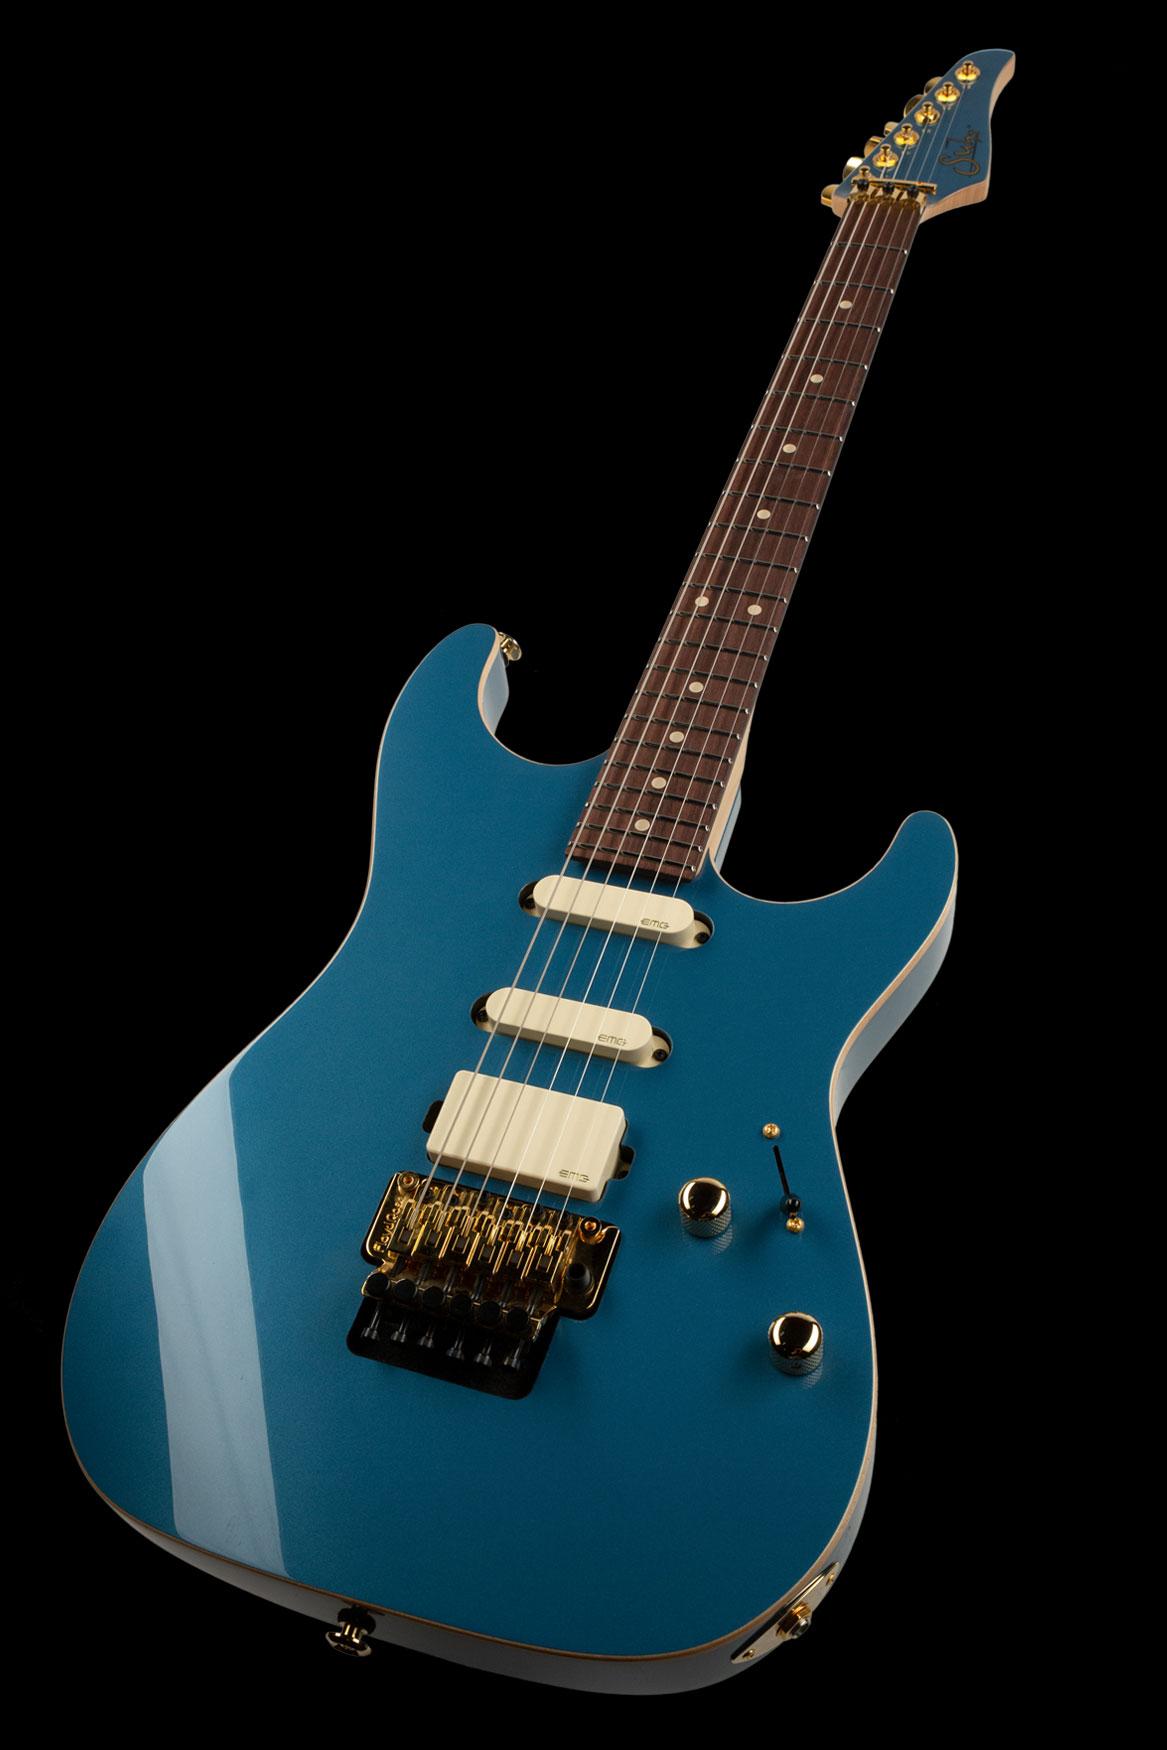 01-LTD-0031: Standard Legacy, Pelham Blue, Original Floyd Rose